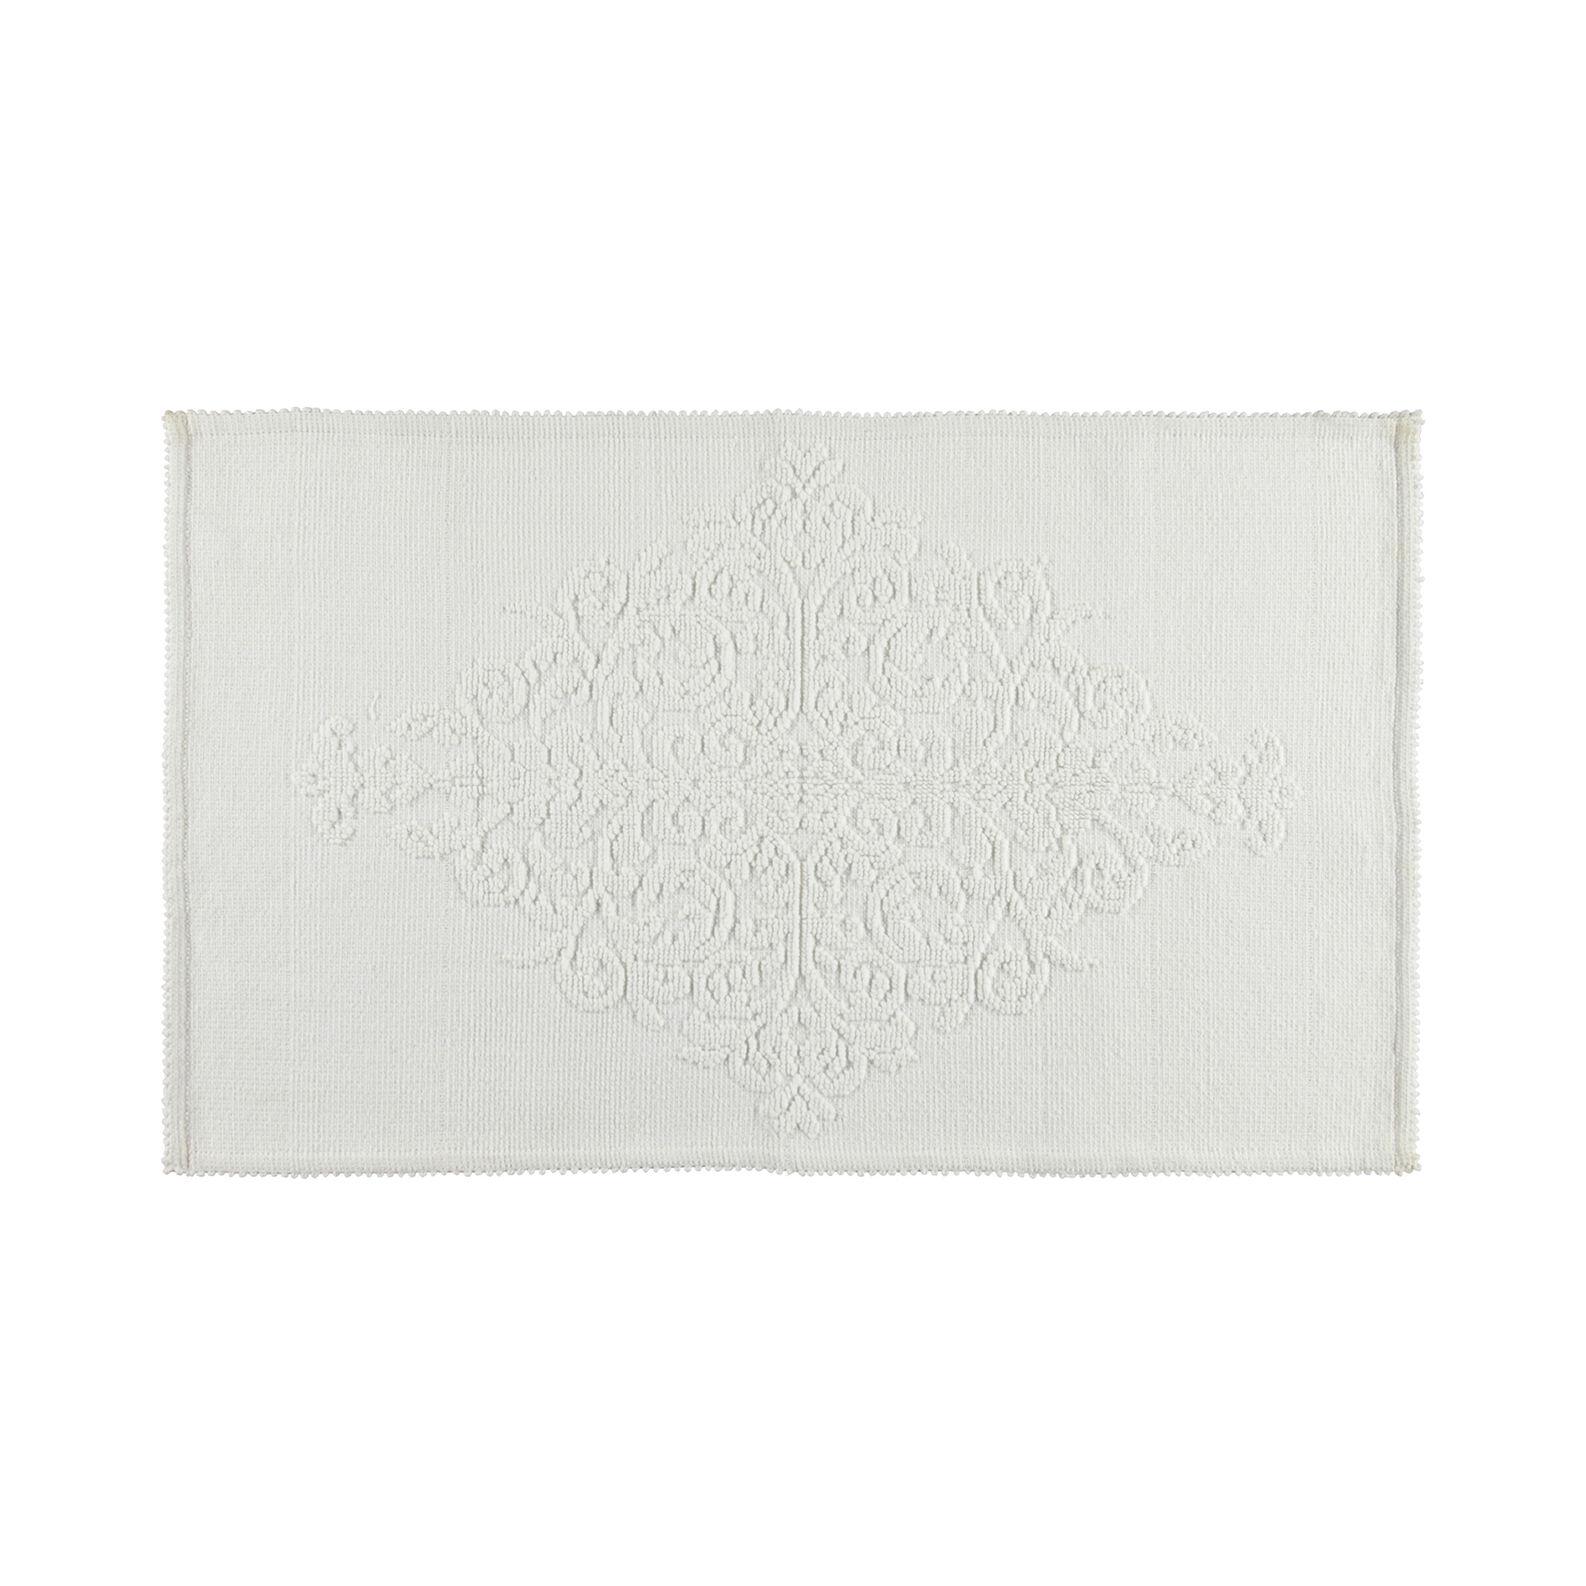 Bath mat with raised decoration